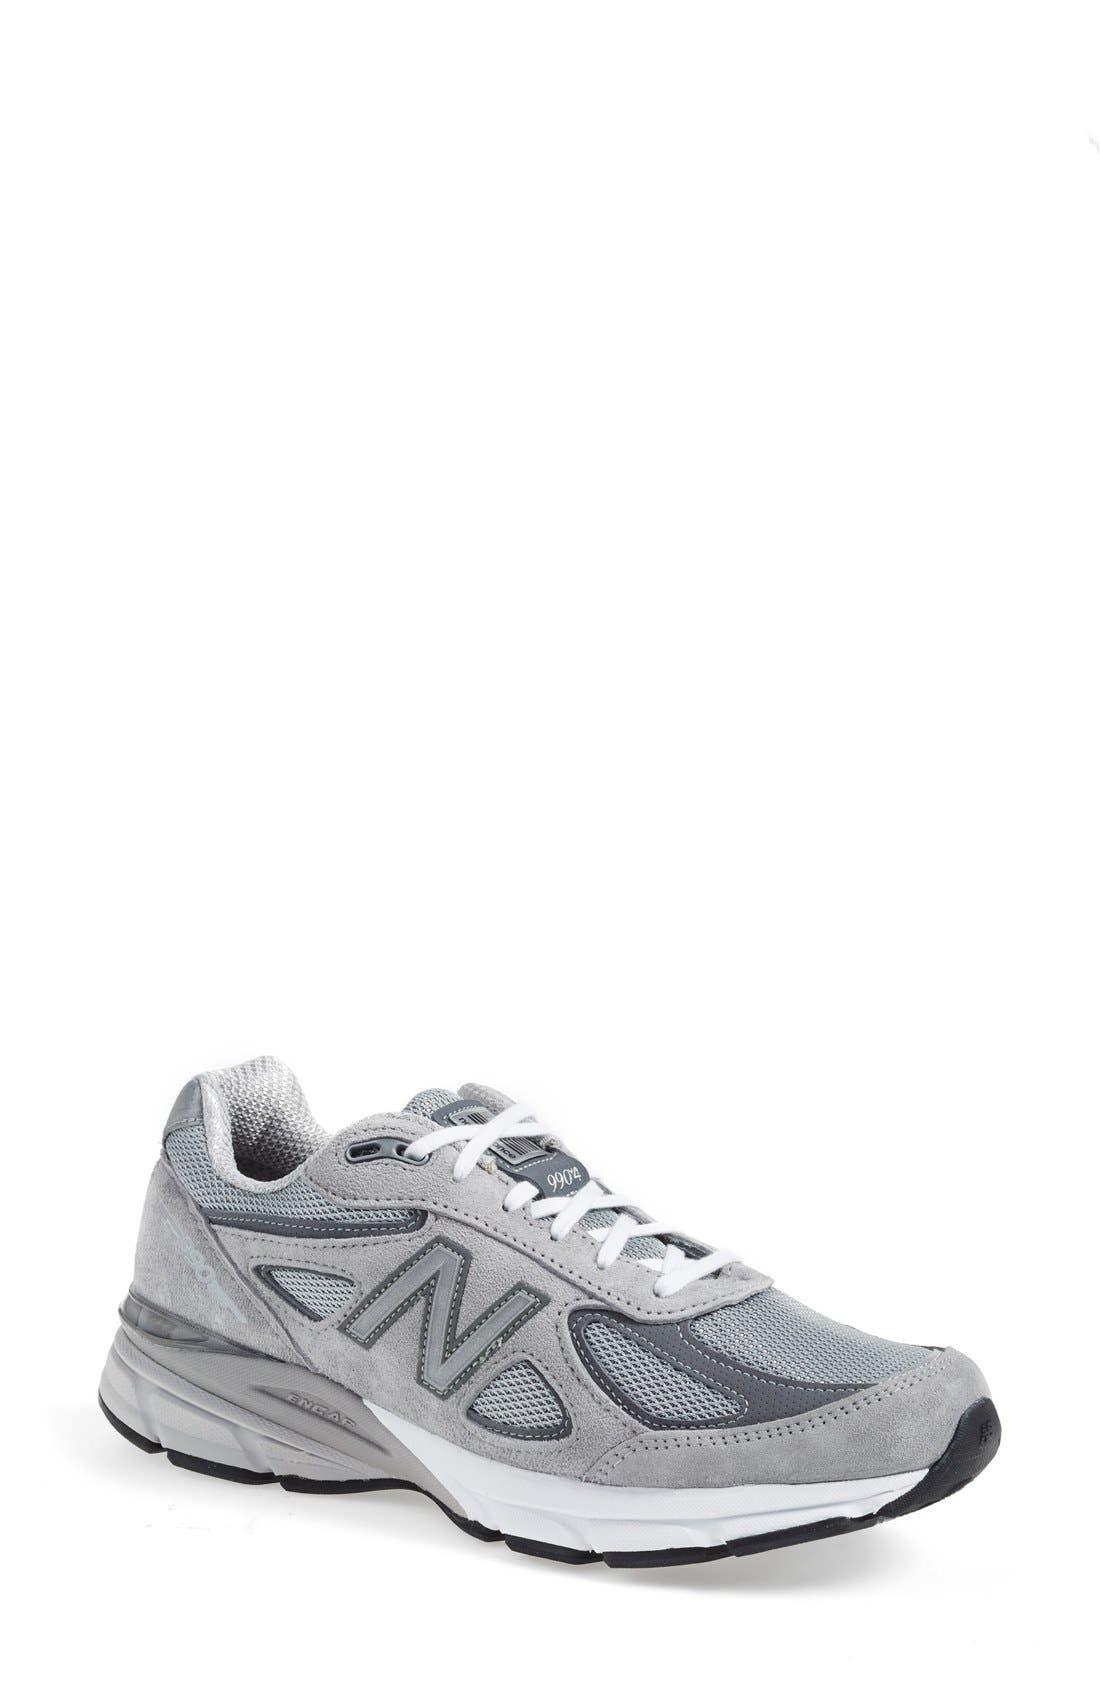 New Balance \u0027990\u0027 Running Shoe (Men)